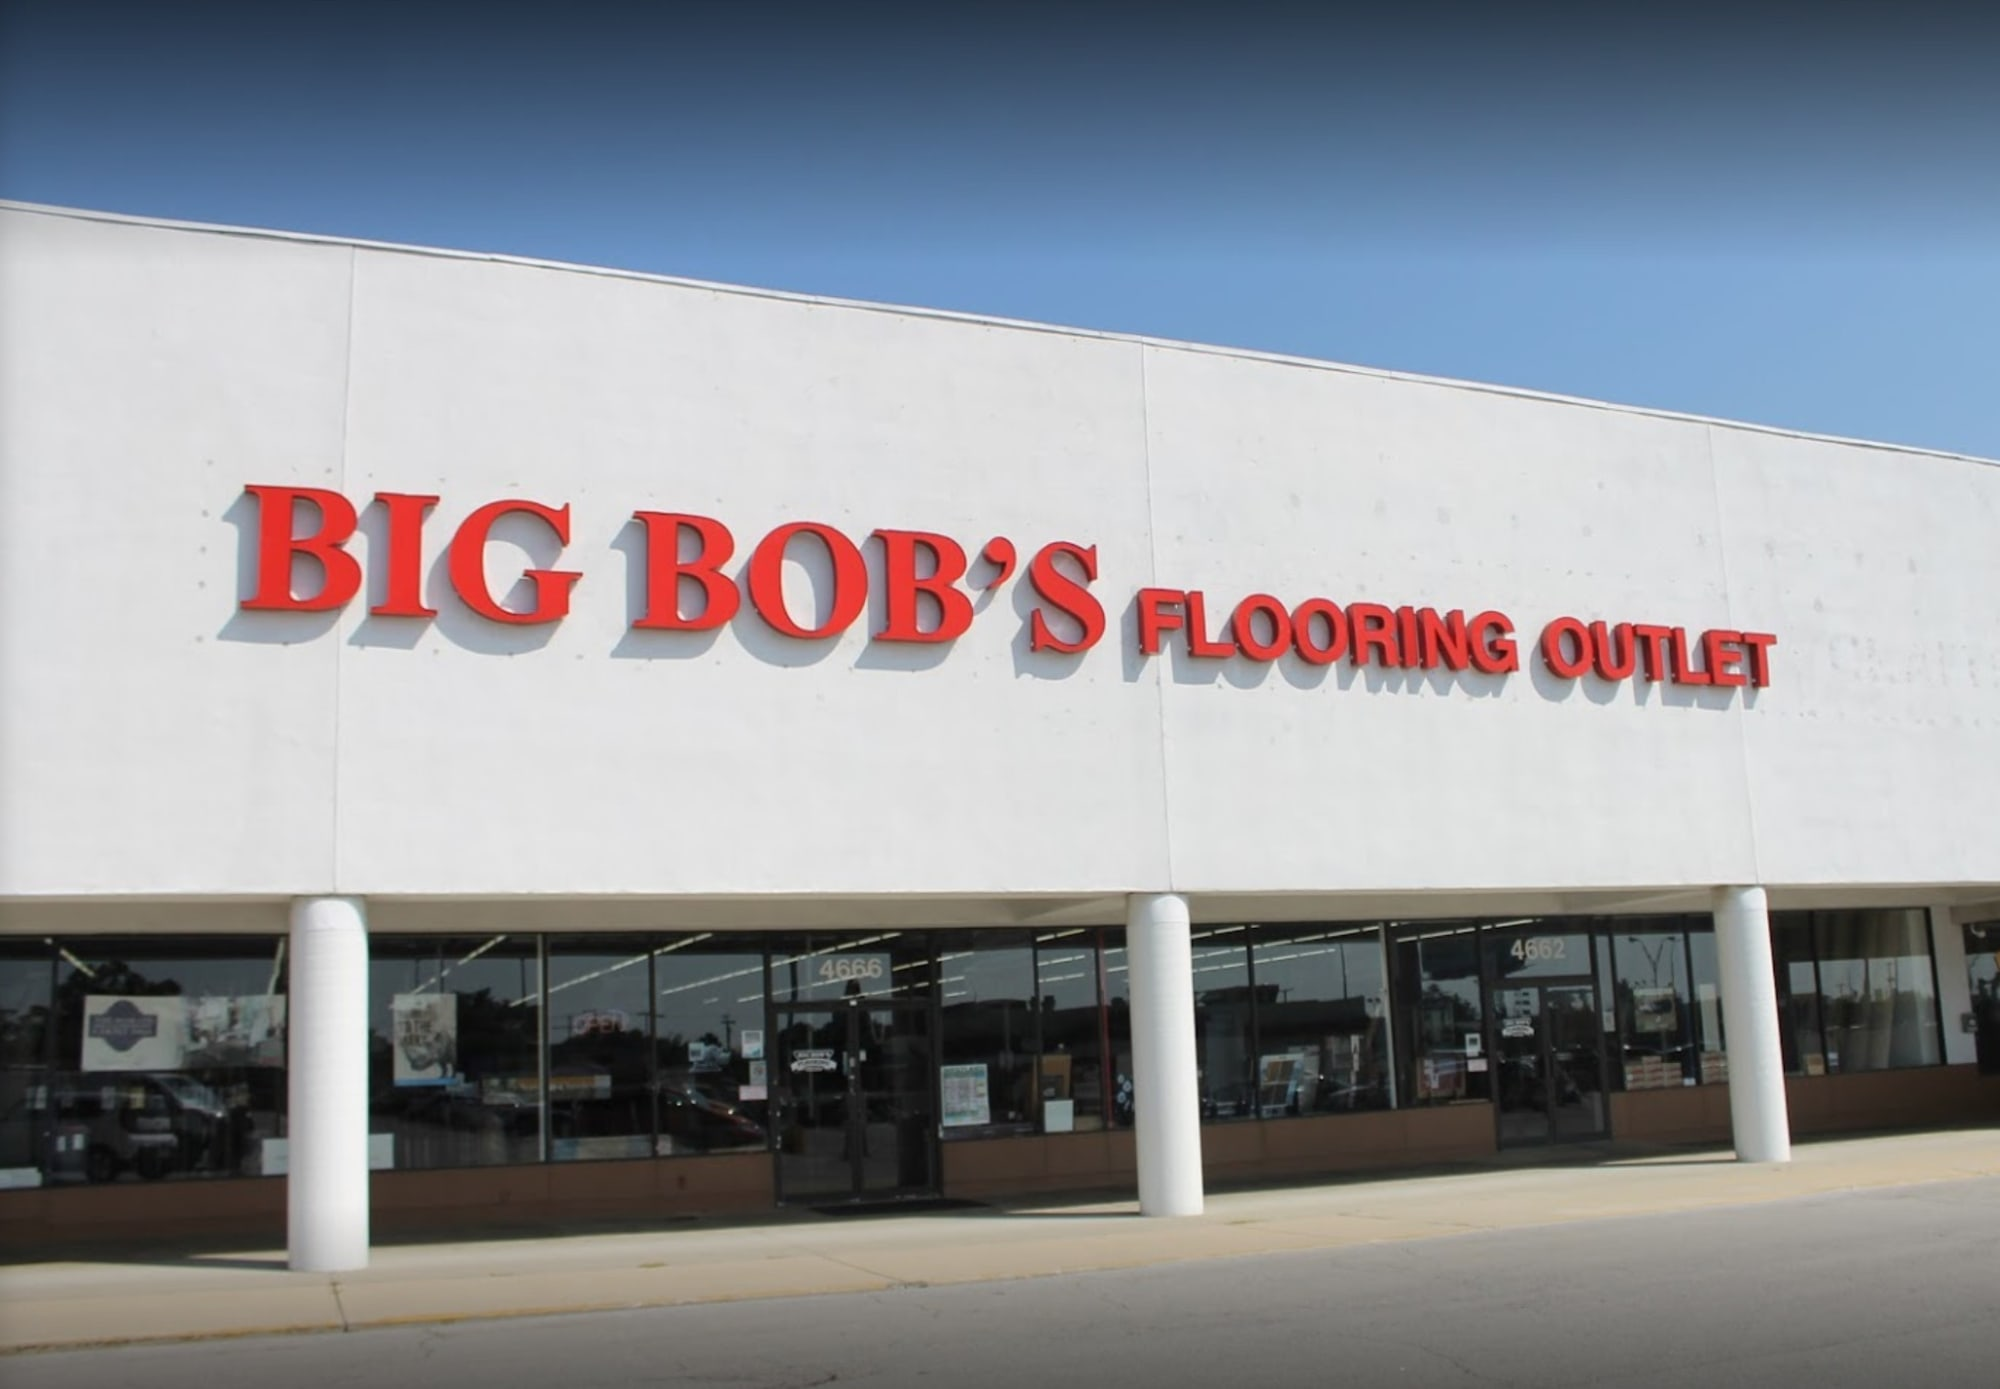 Big Bob's Flooring Outlet - 4666 W Broad St Columbus, OH 43228